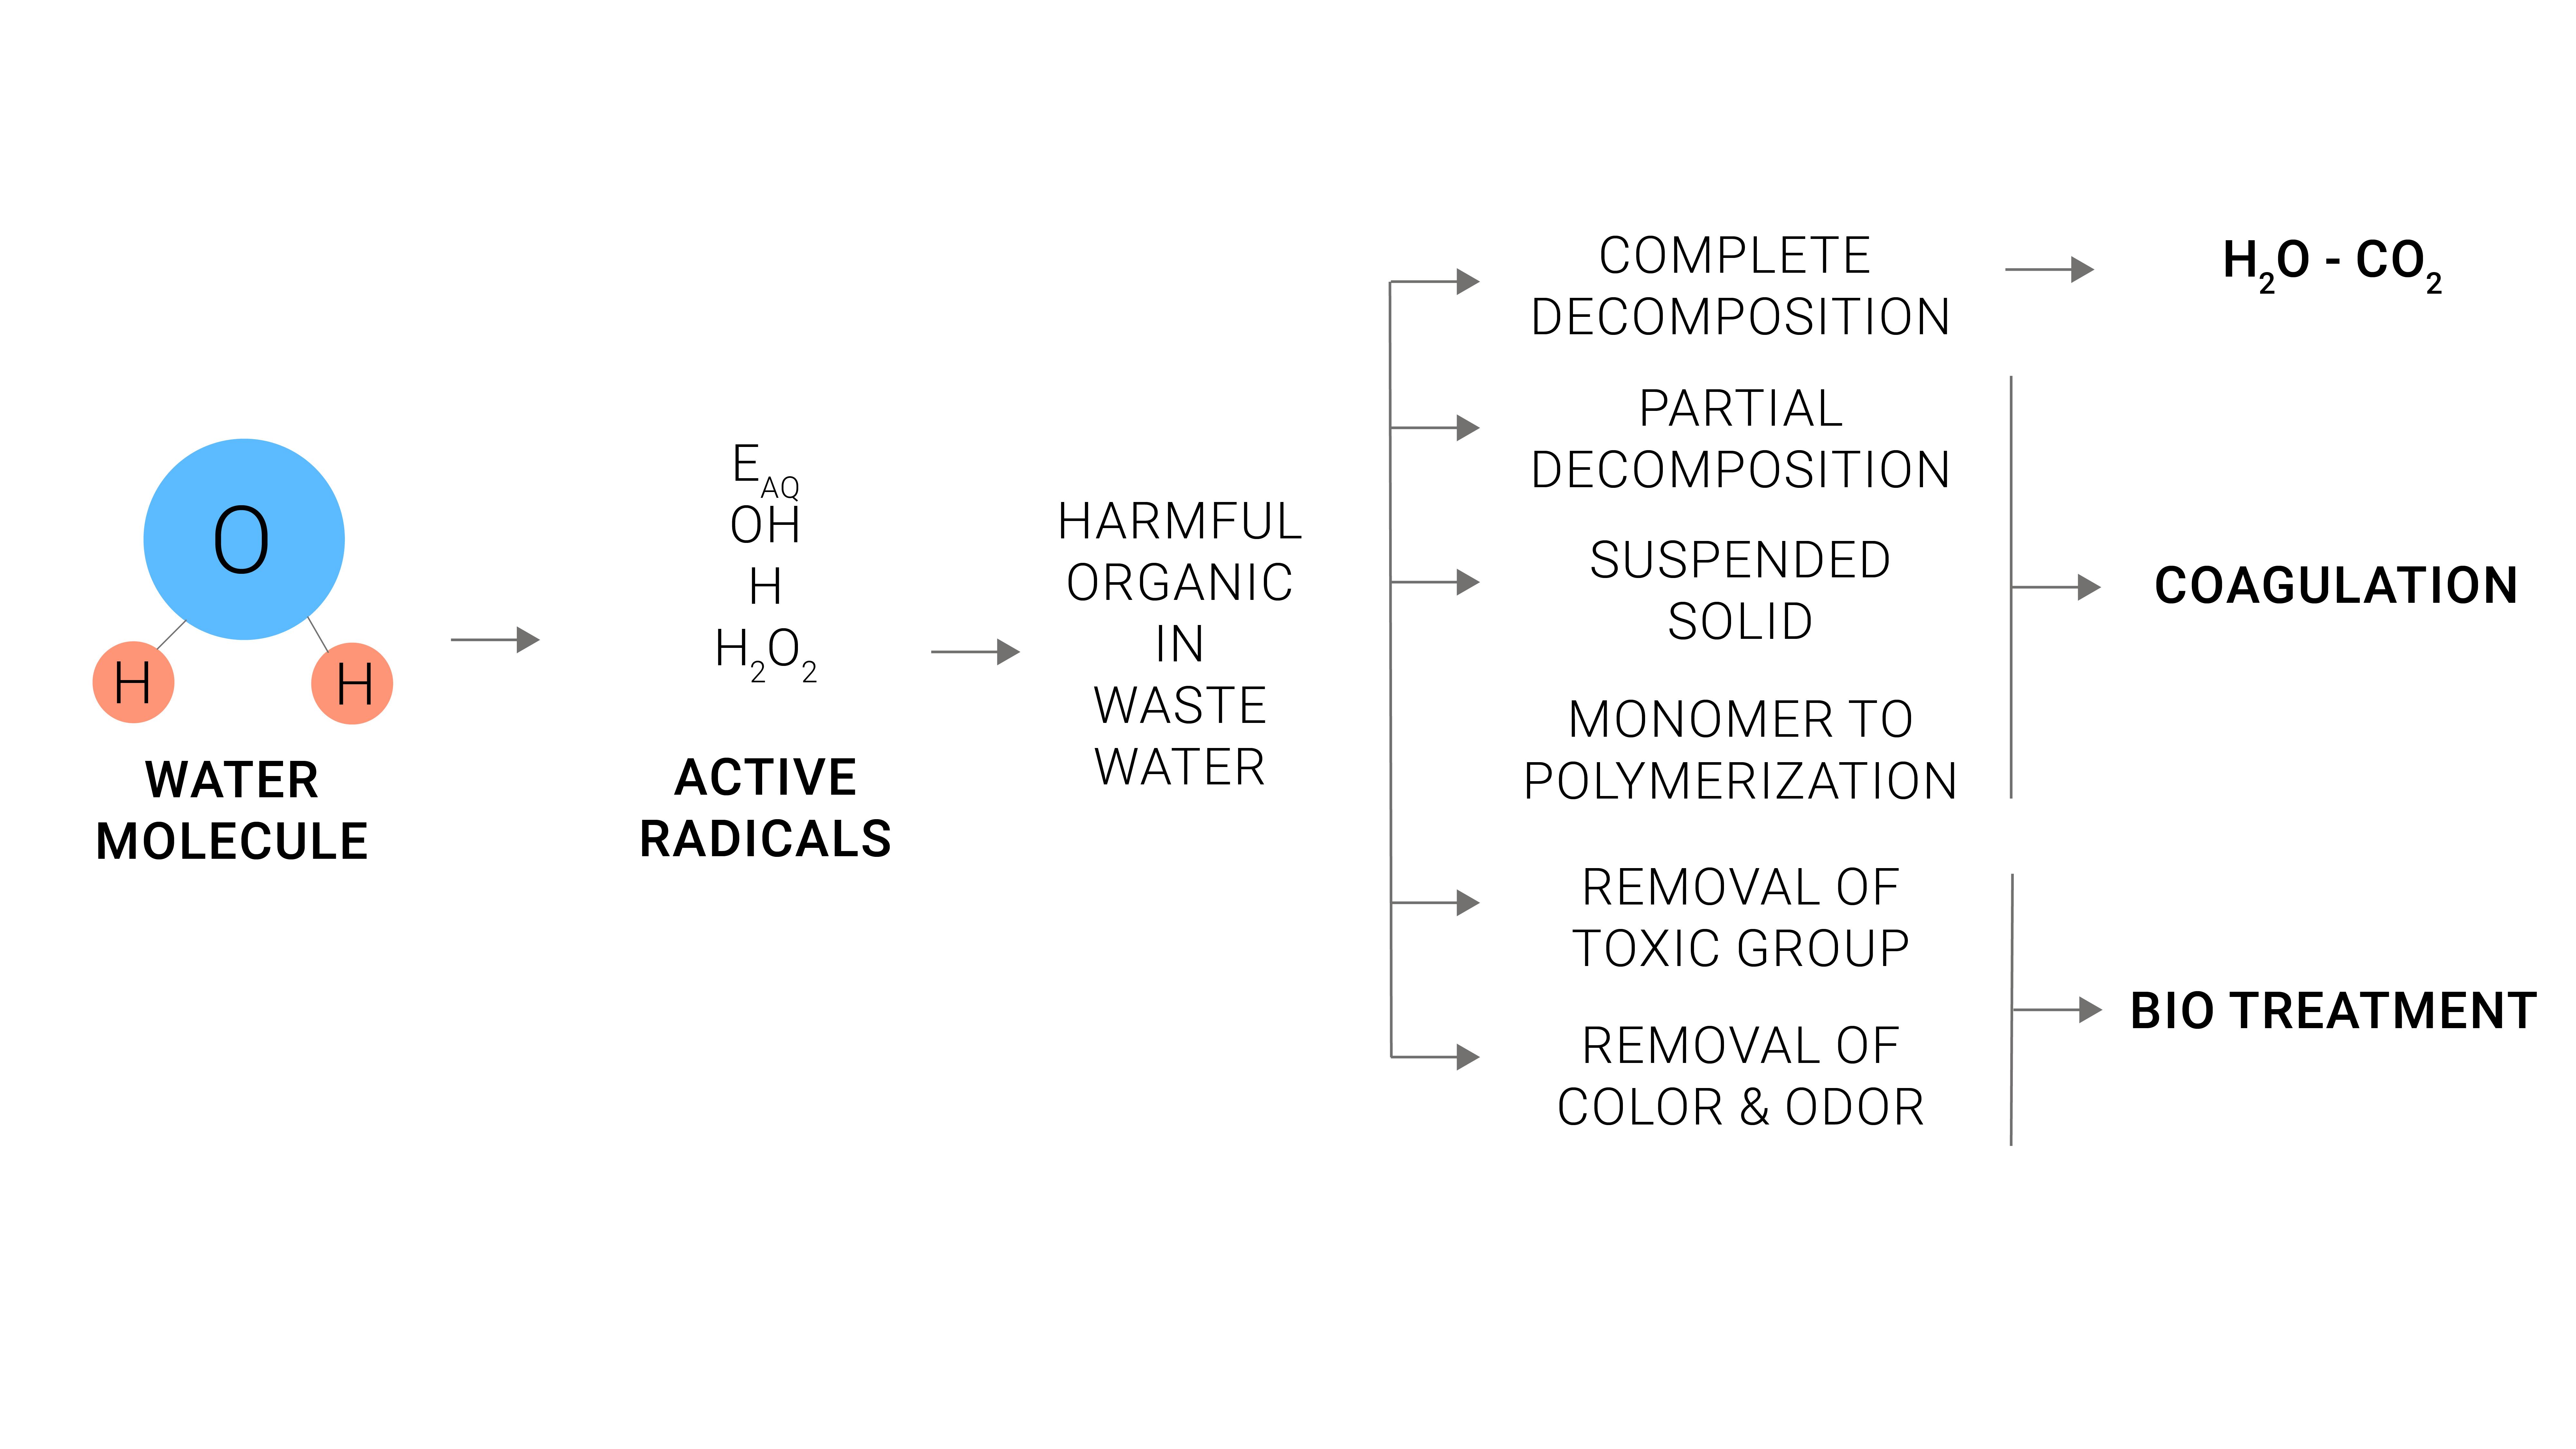 waste water electron beam